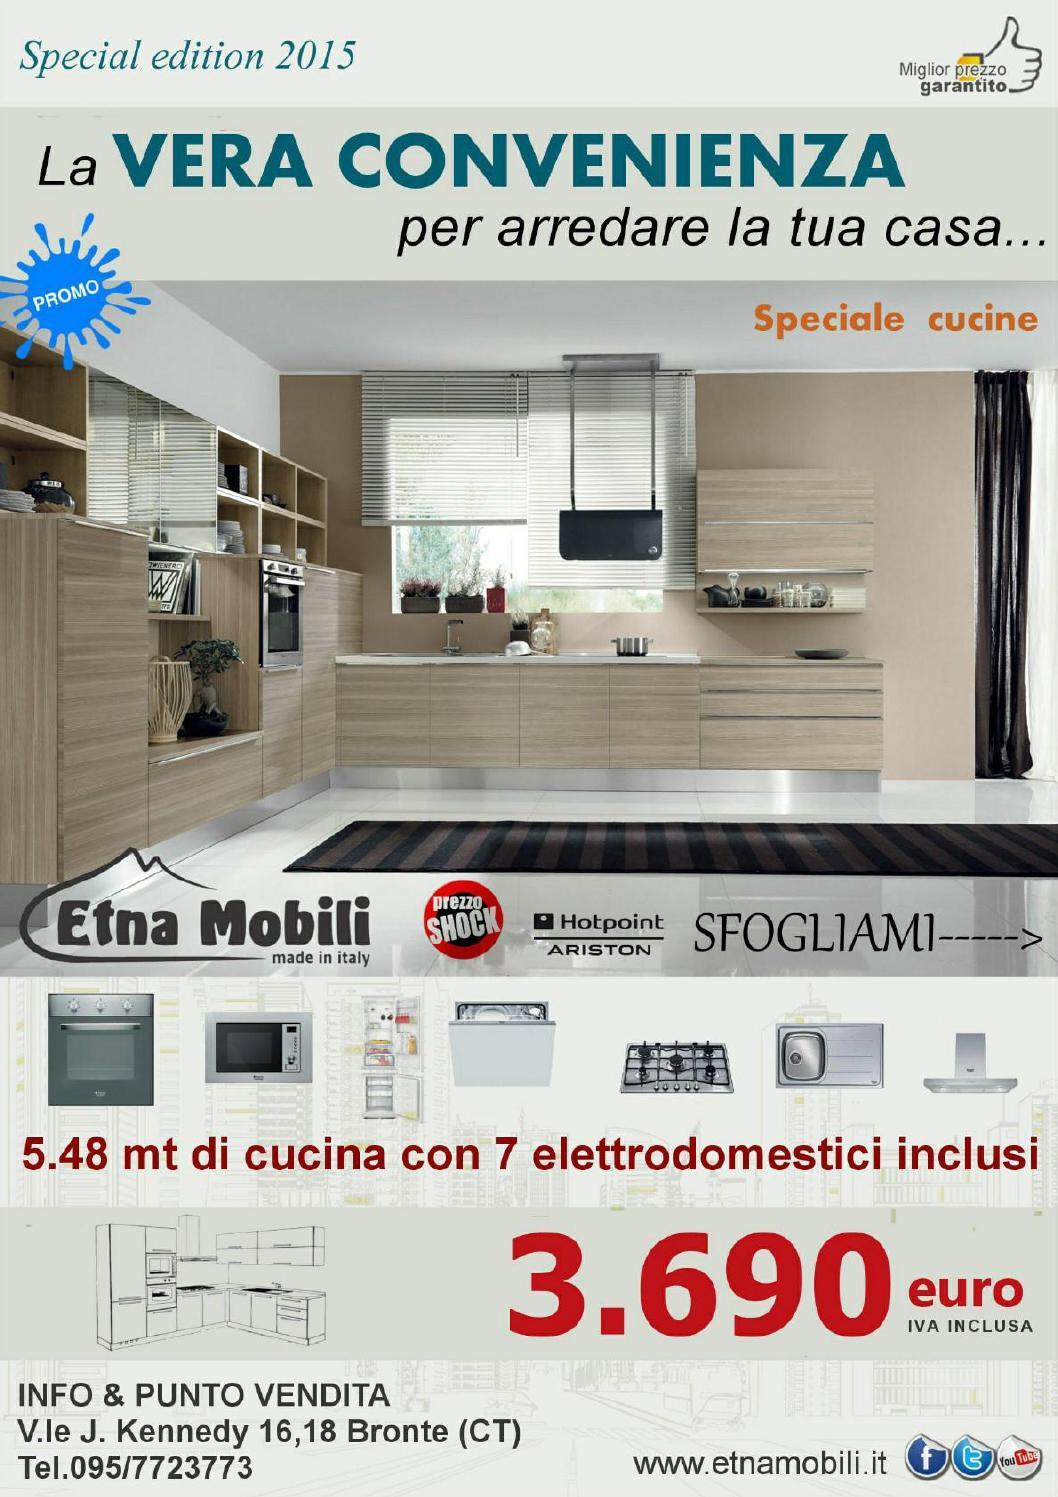 Volantino brochure etna mobili 2014 2015 by etna mobili for Volantino casa e co foggia